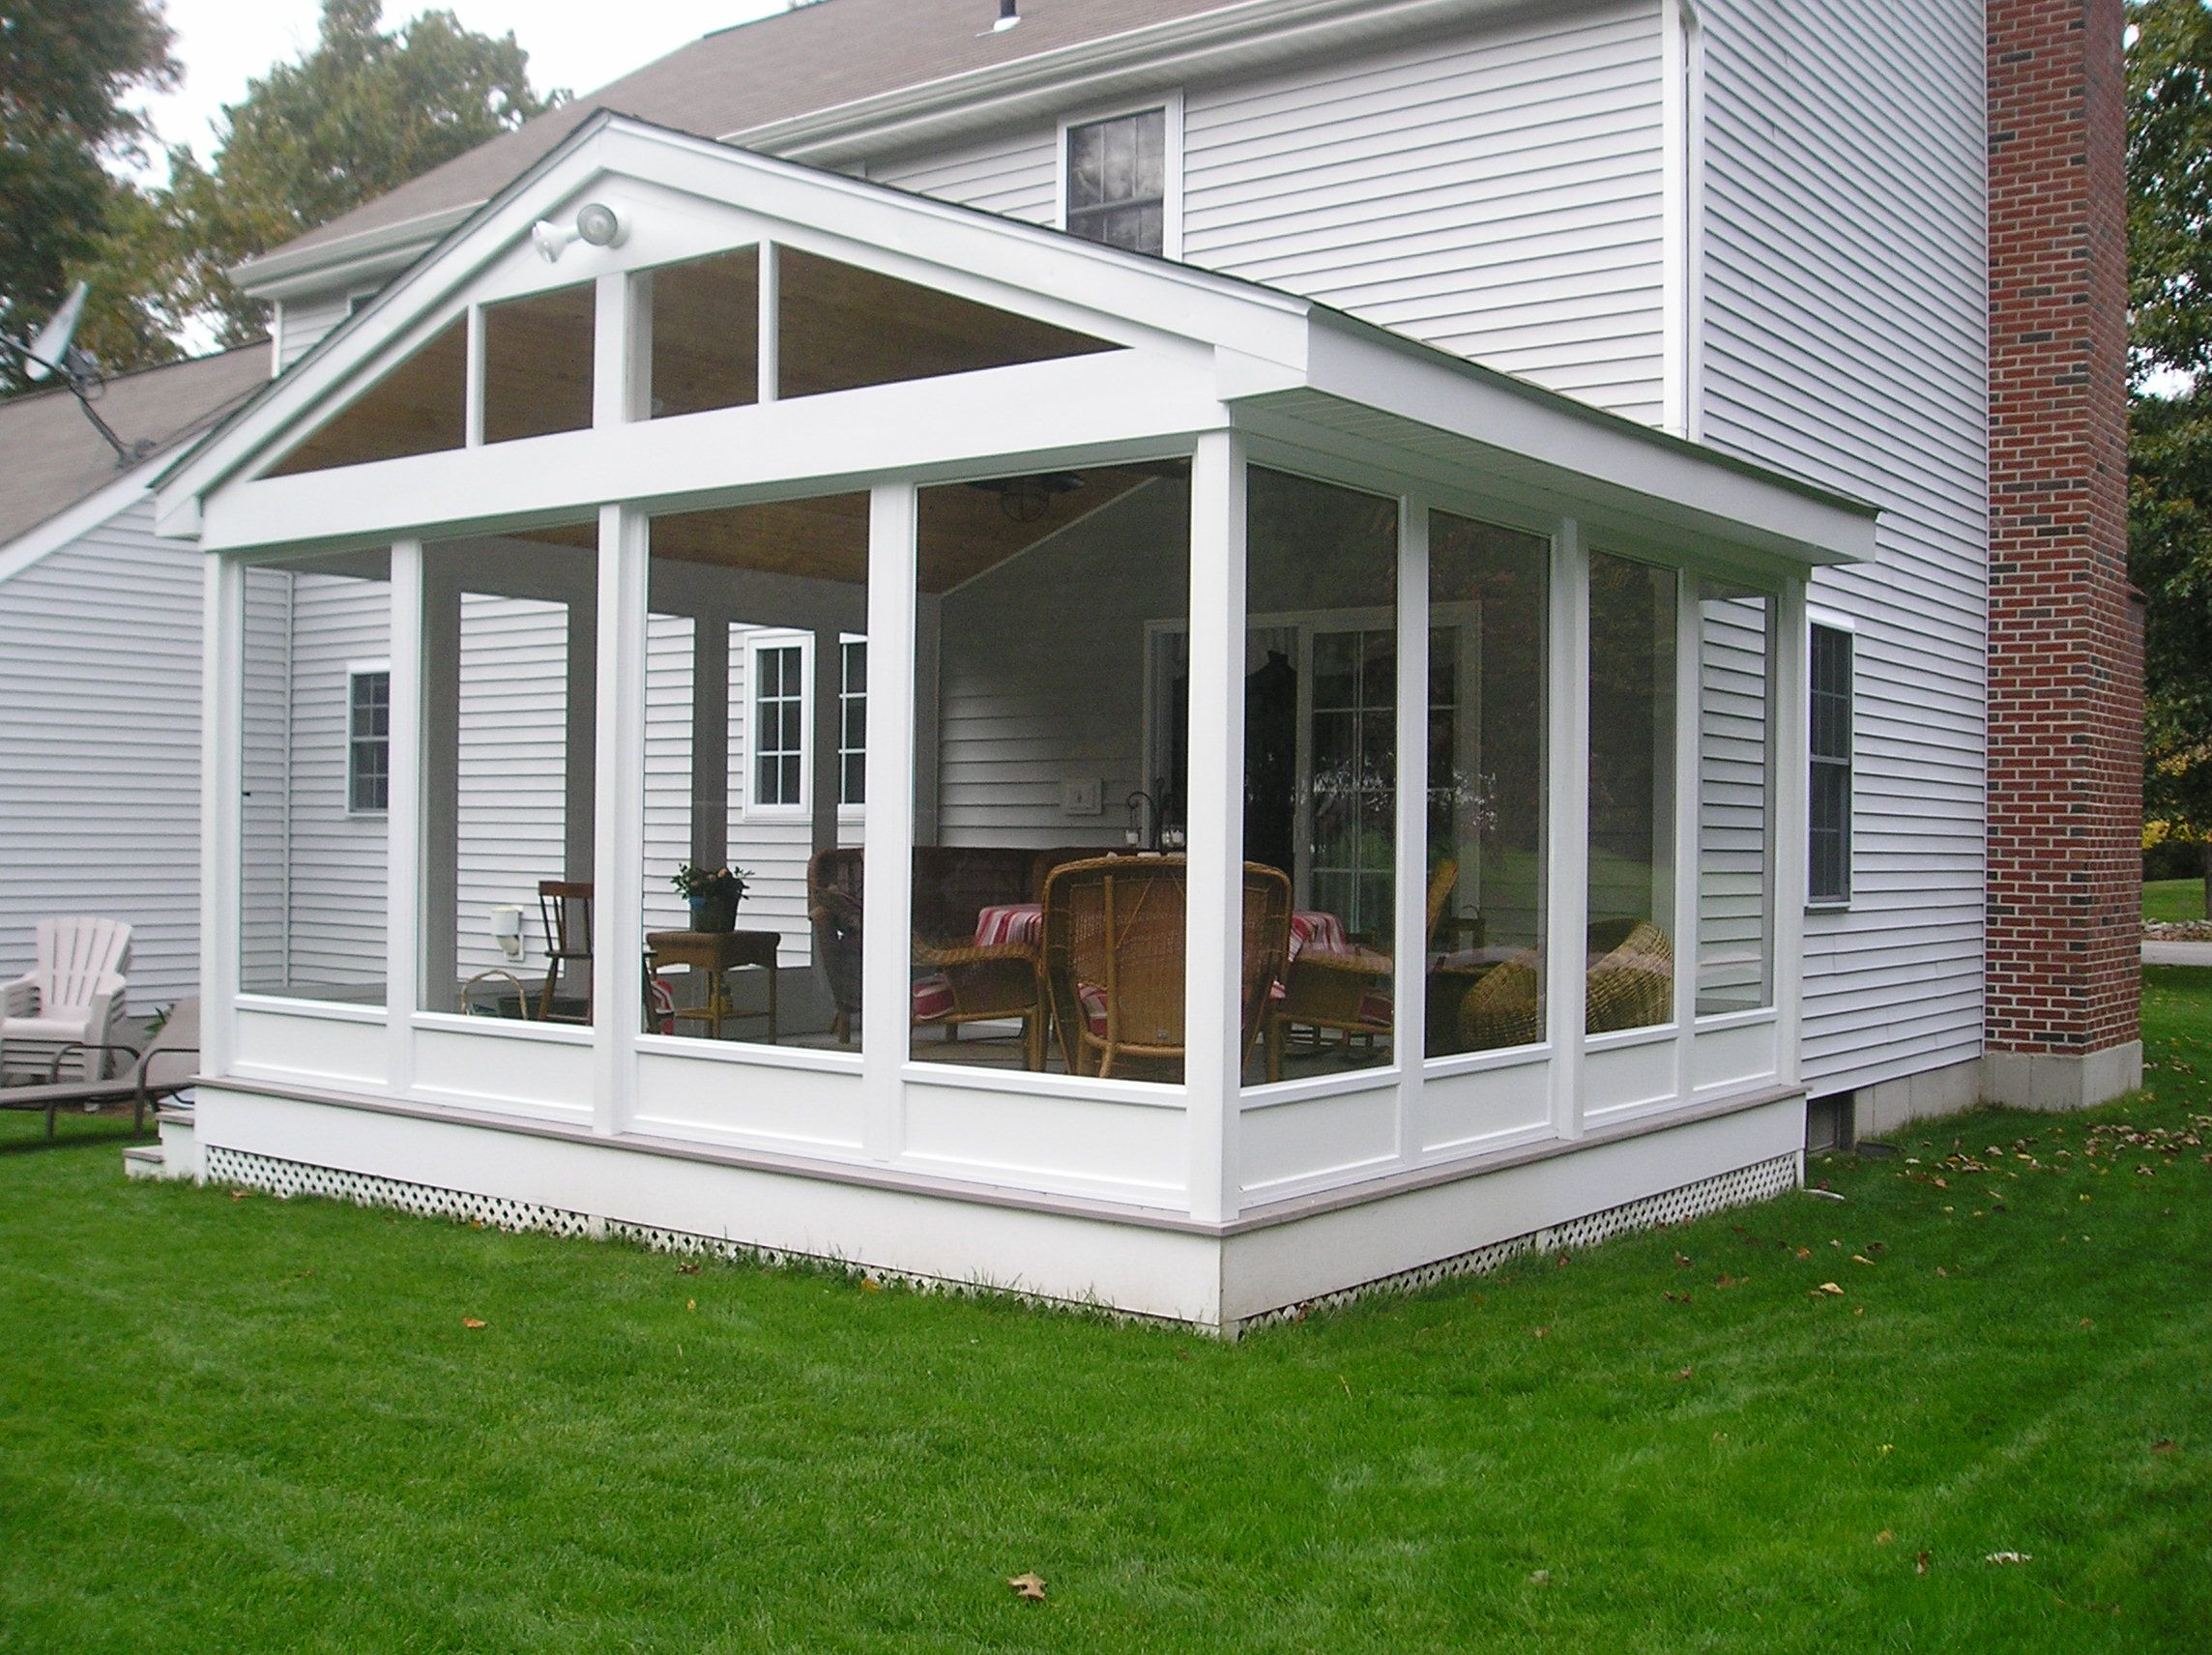 Screen Porch Enclosures Enjoy A Screen Porch Year Round ... on Outdoor Patio Enclosure Ideas  id=80934